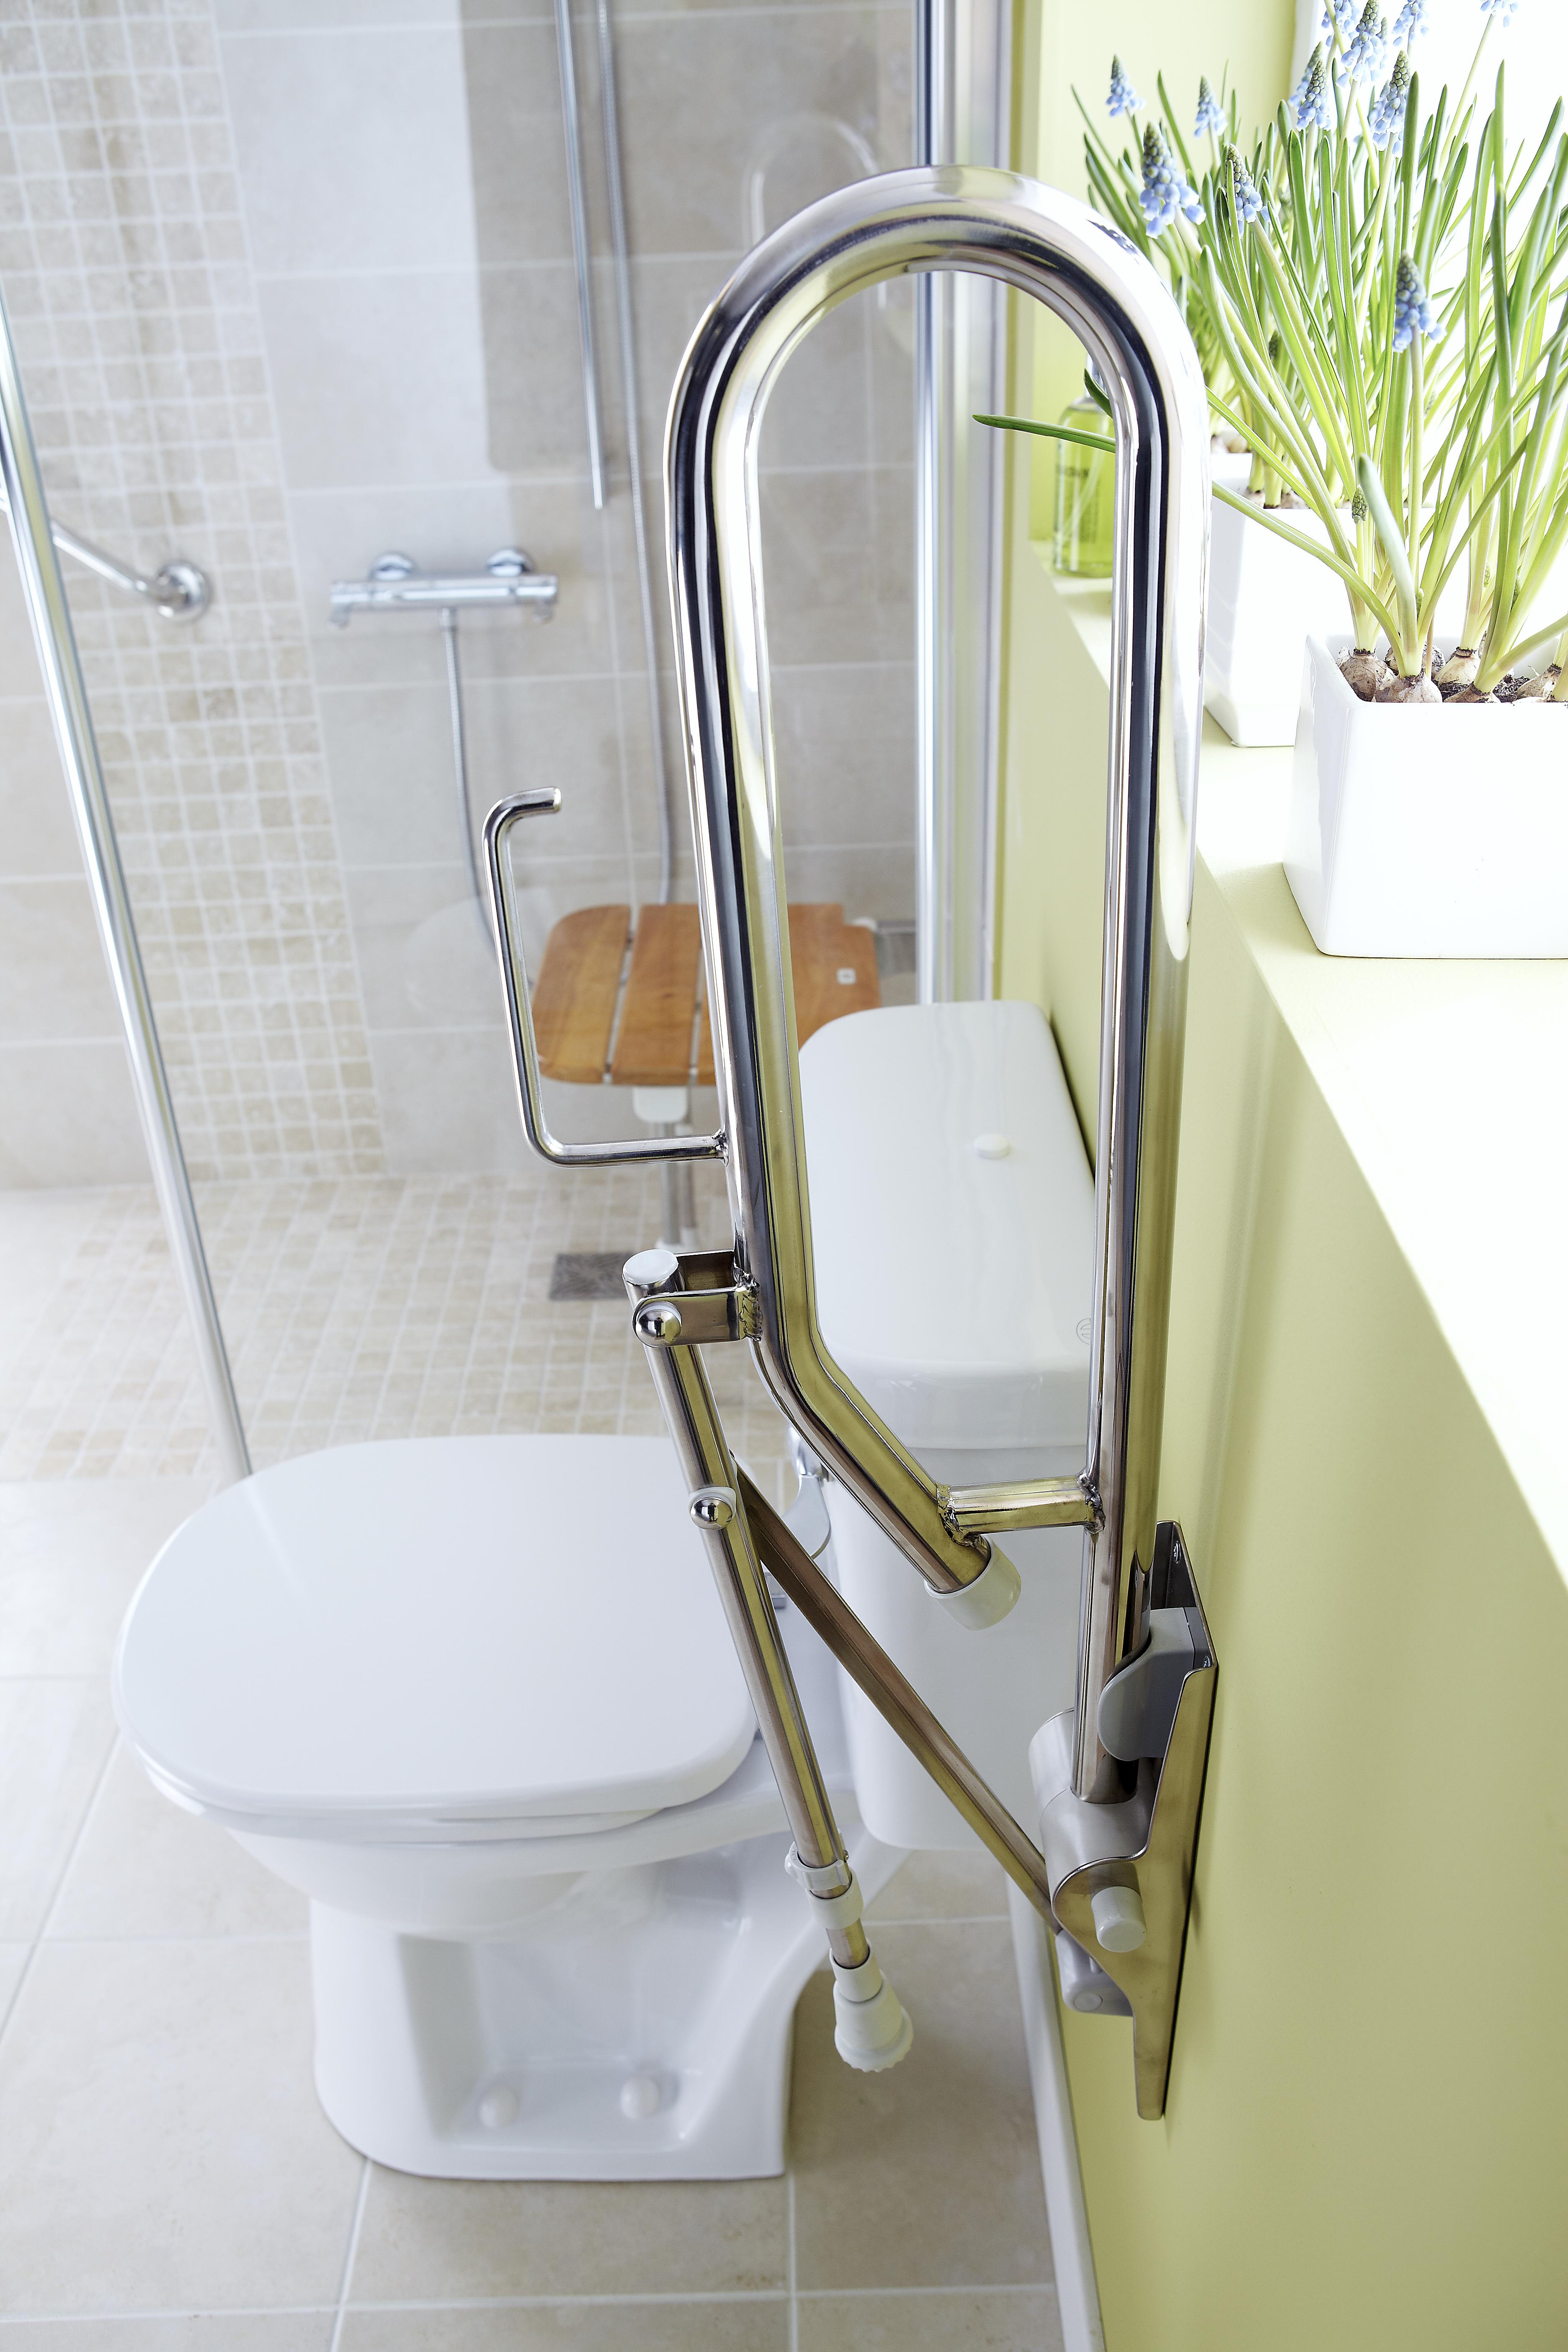 Behindertengerechtes Bad Planen barrierefreies bad altersgerecht behindertengerecht